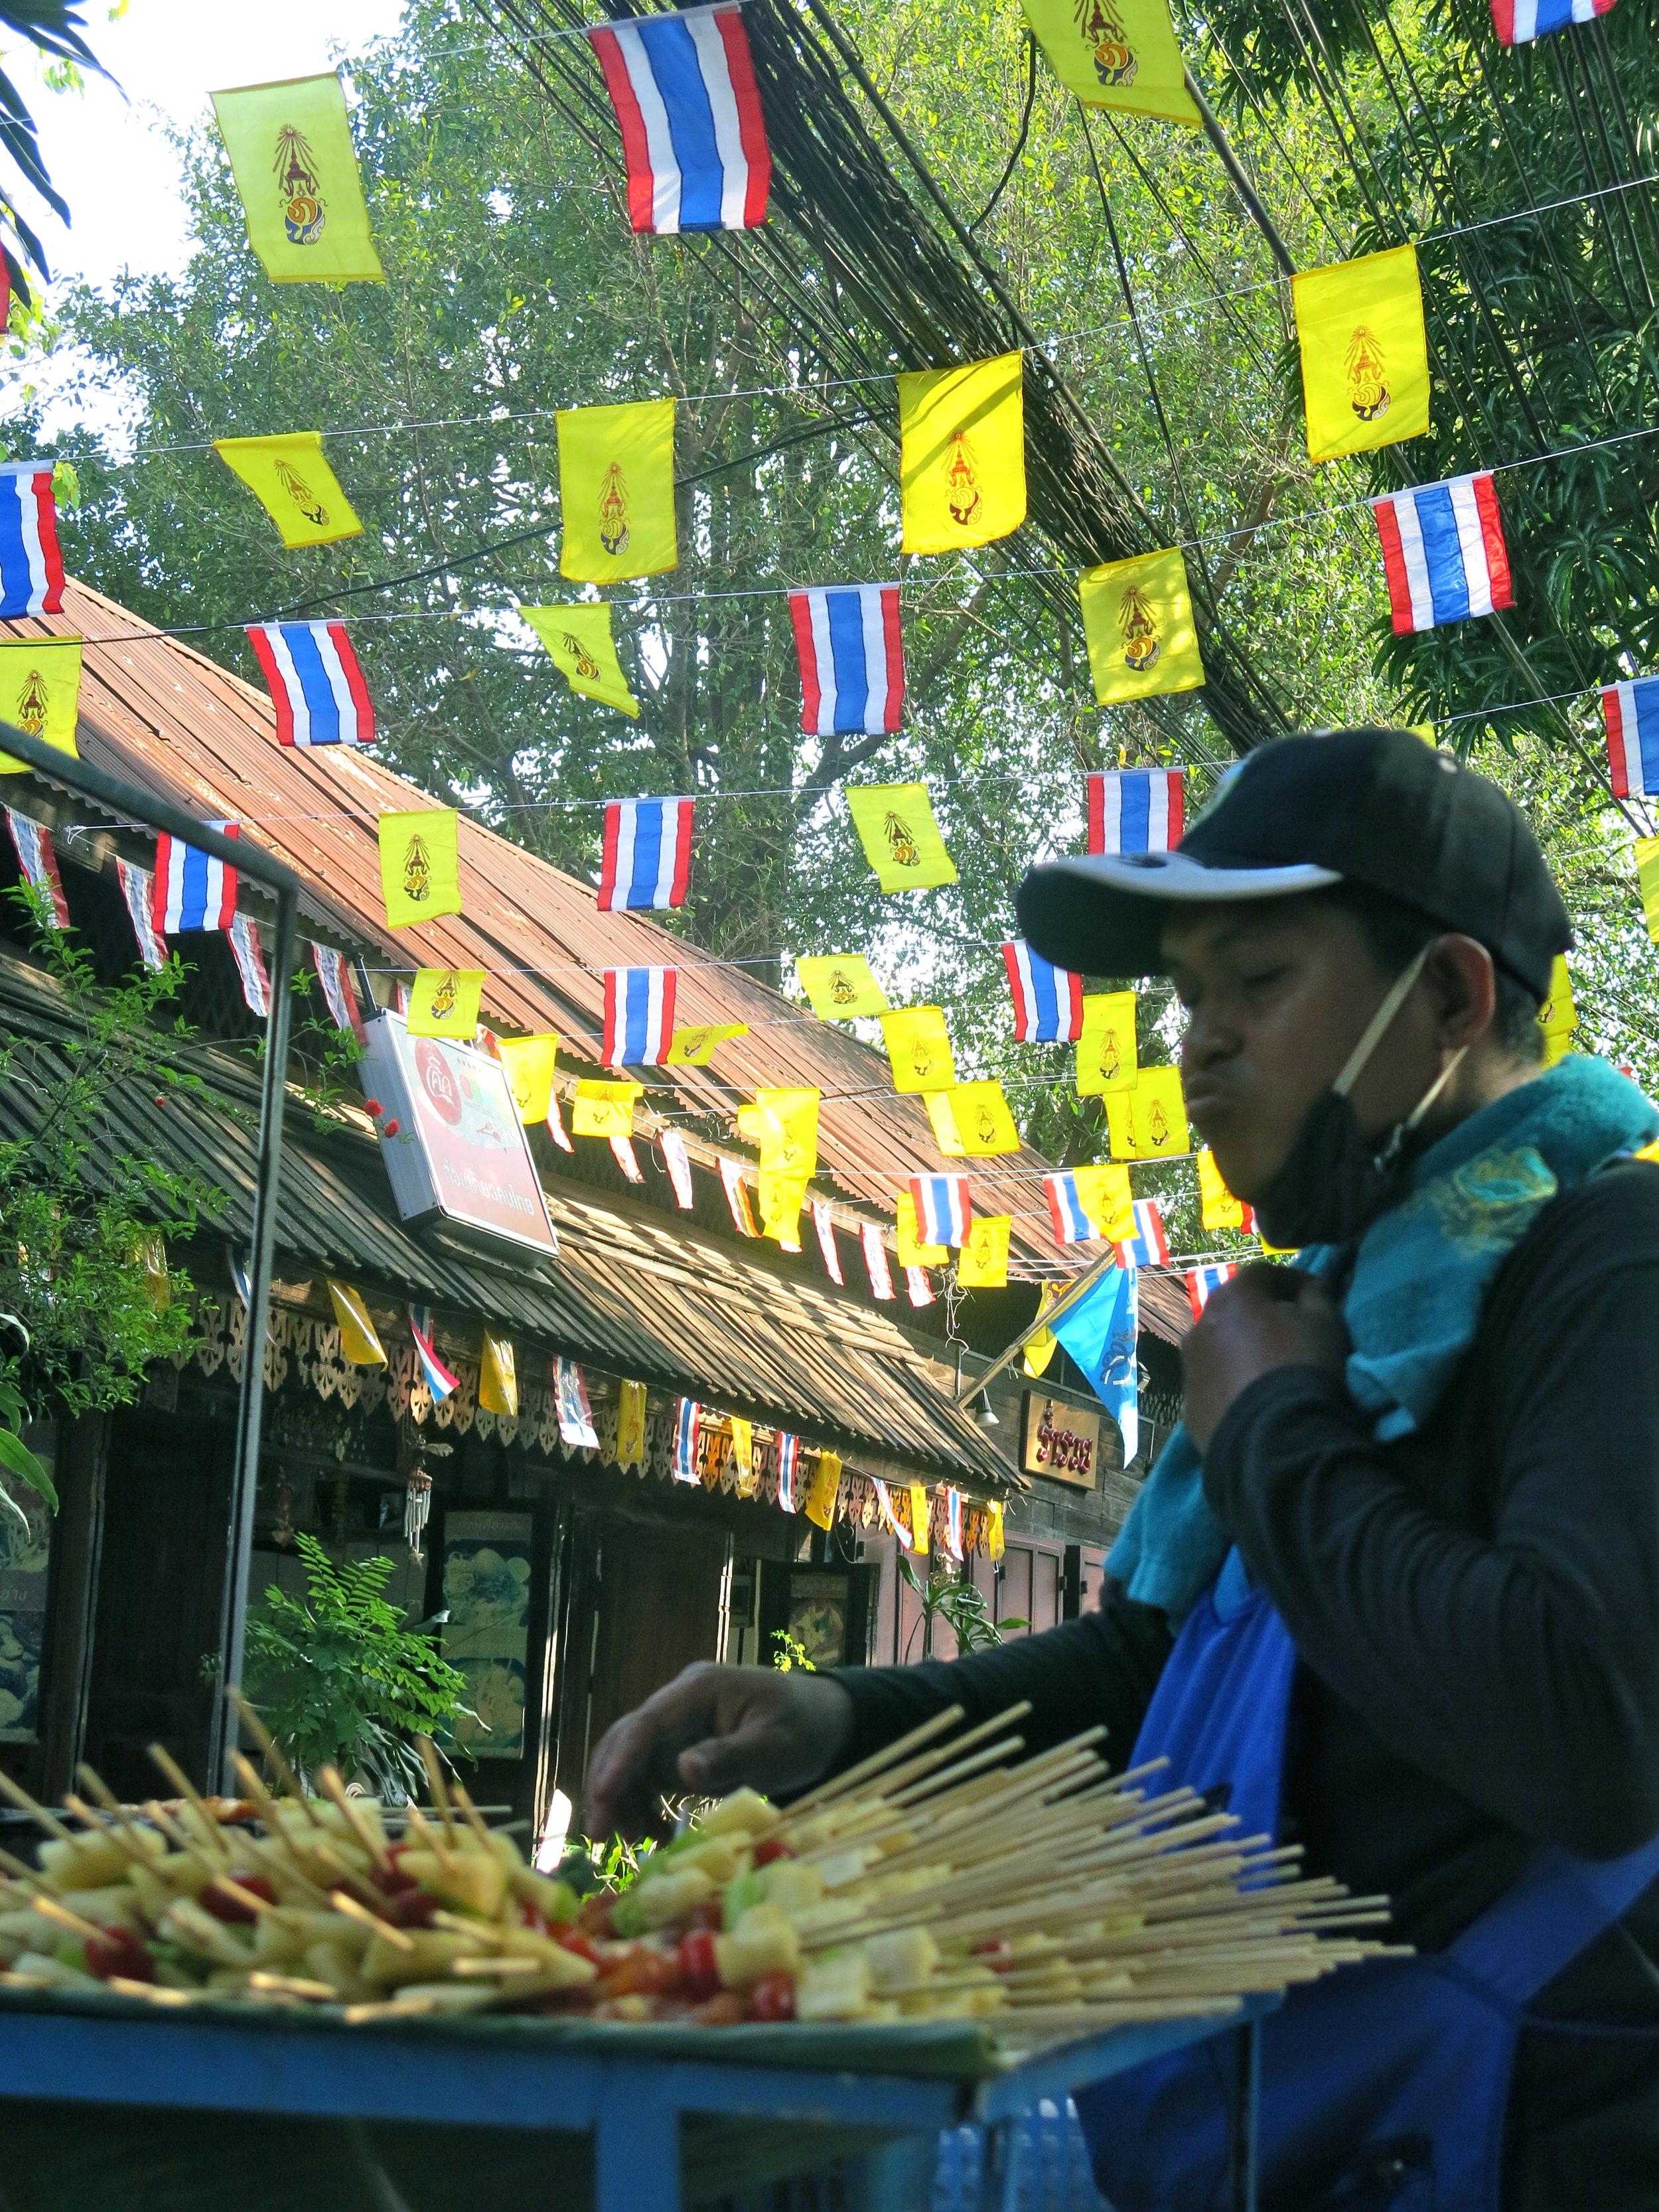 Street food stall in Thonburi district